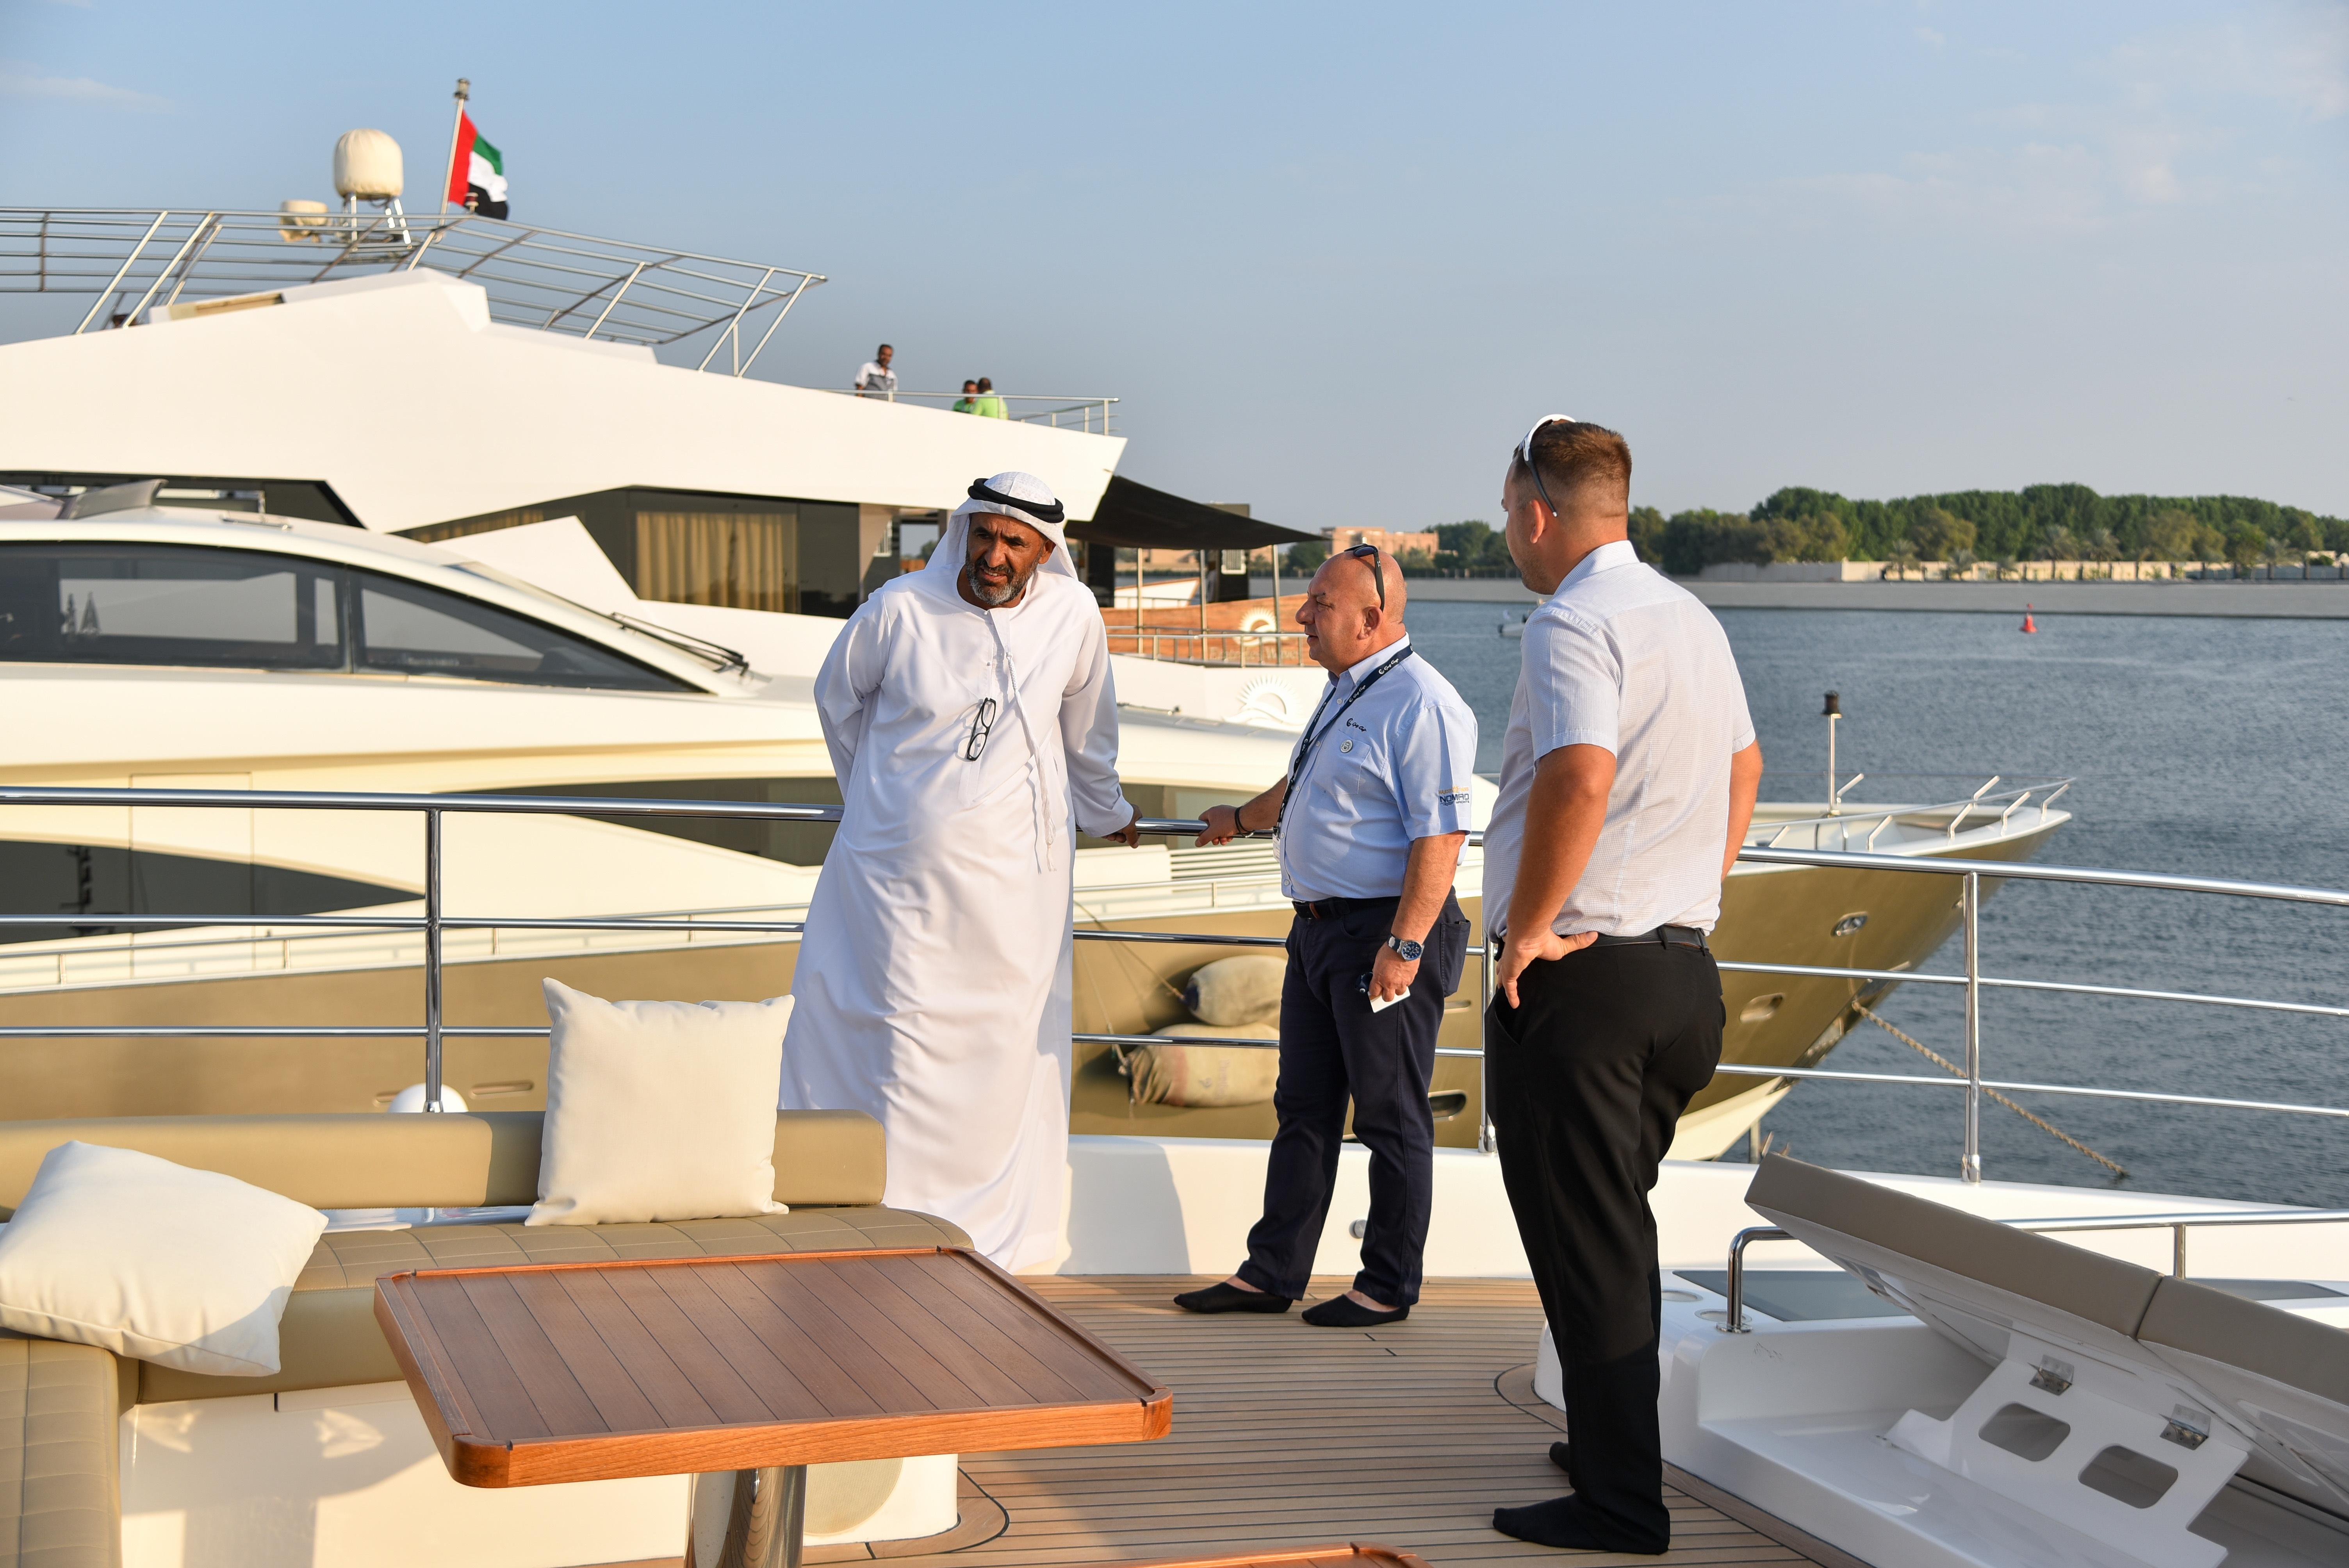 Gulf Craft at Abu Dhabi Boat Show 2018 Day 3 (8).jpg